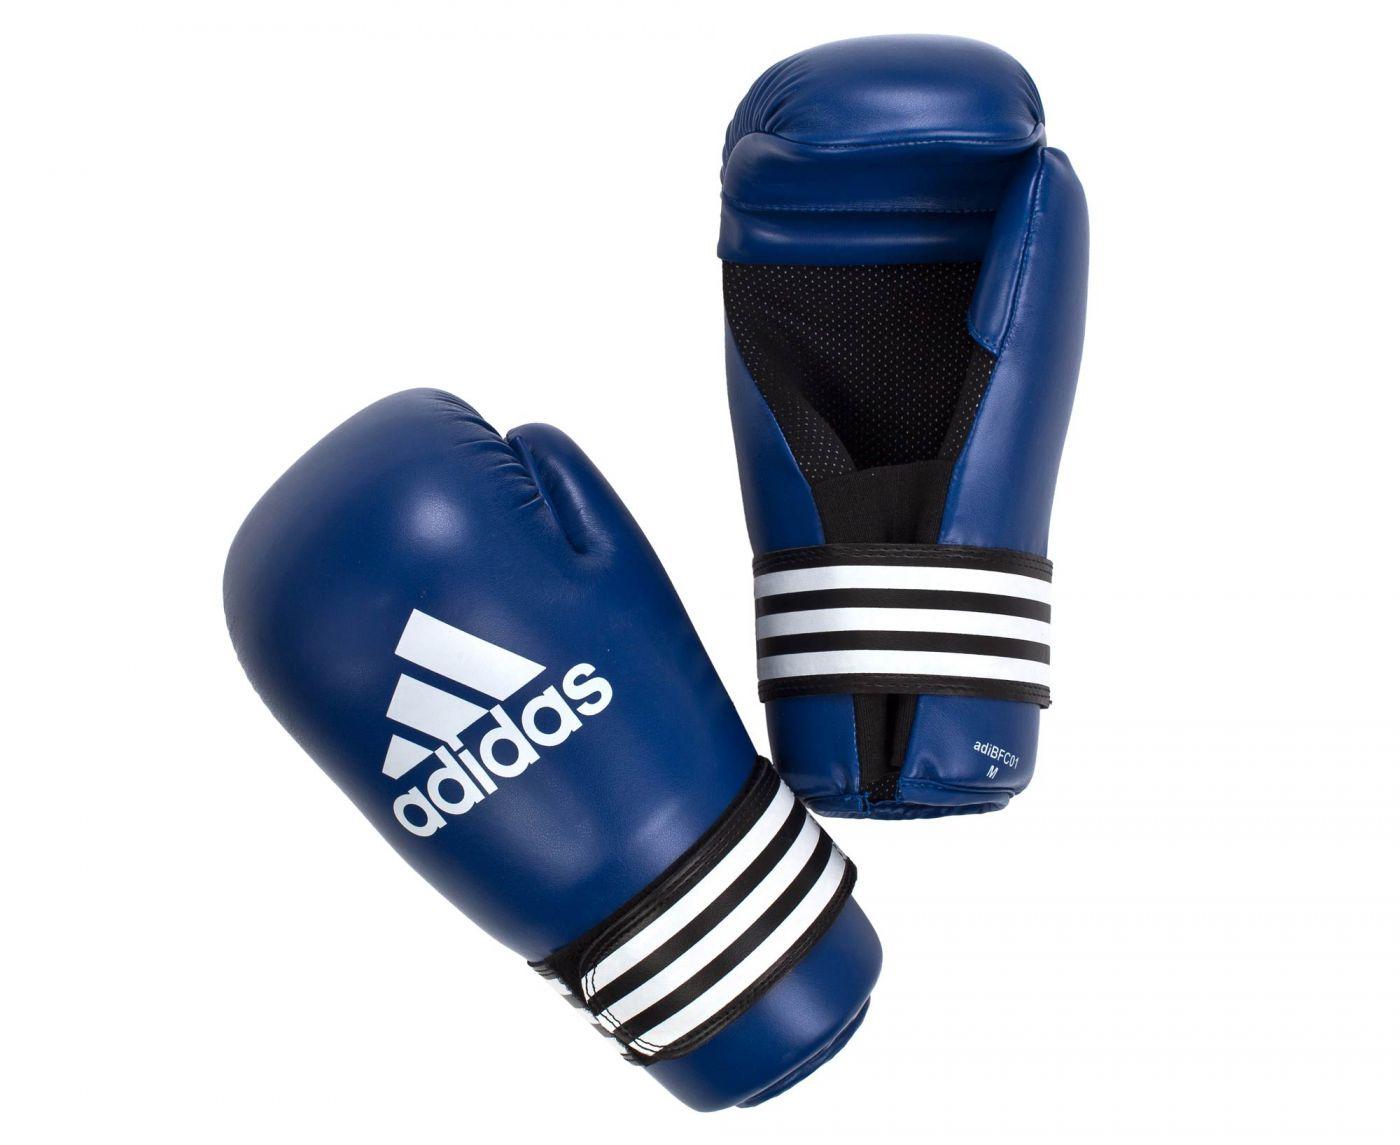 Перчатки для полуконтакт Adidas Semi Contact Gloves синие , размер S, артикул adiBFC01